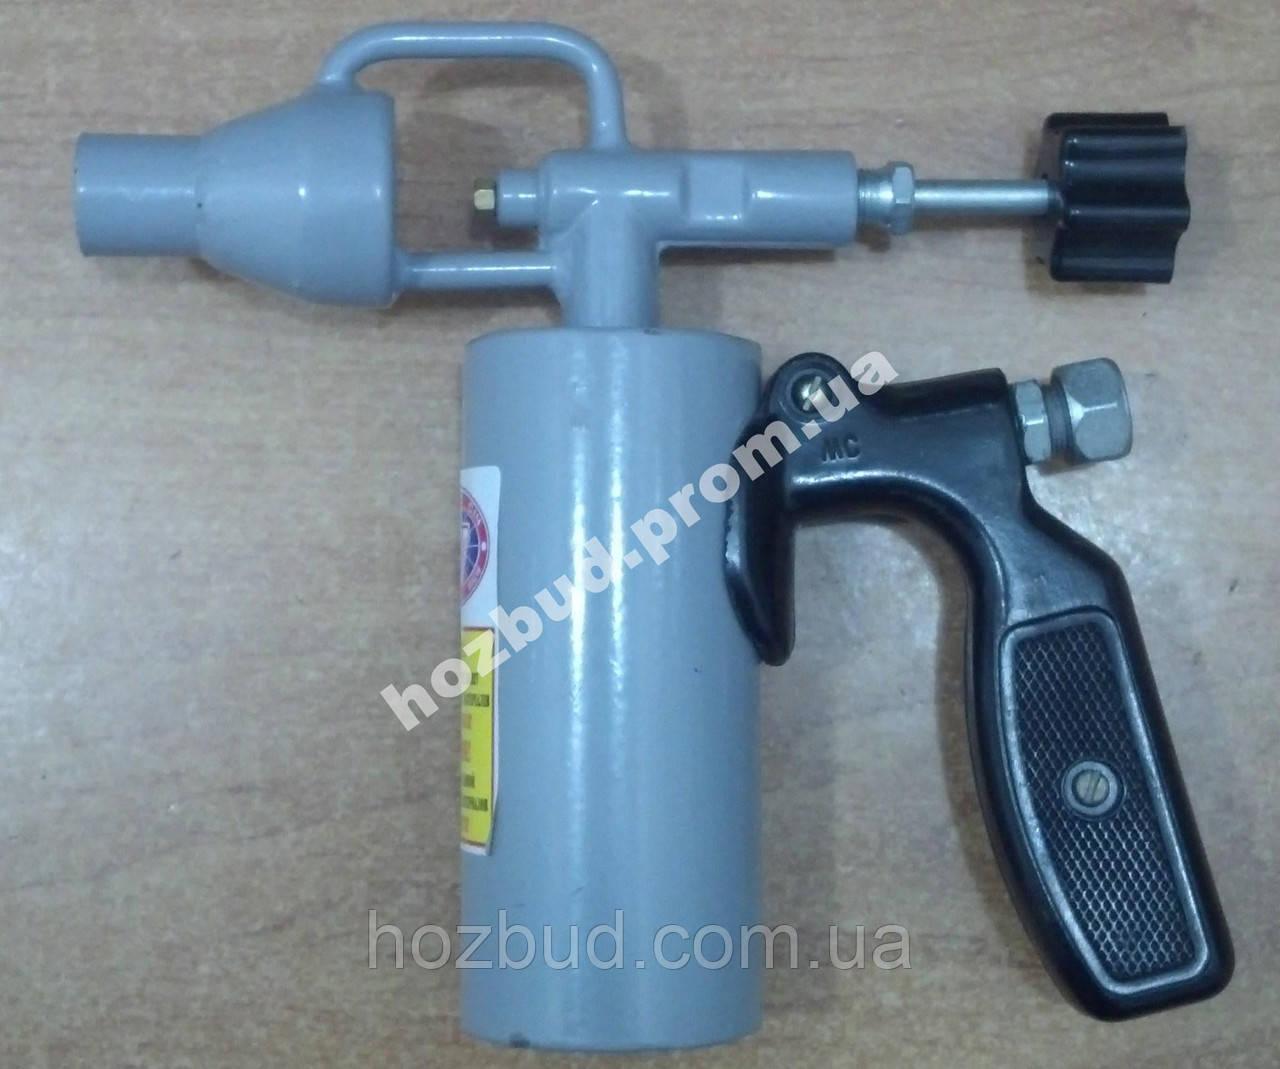 Лампа паяльная Мотор Сич ЛПБ-0.15ВМ